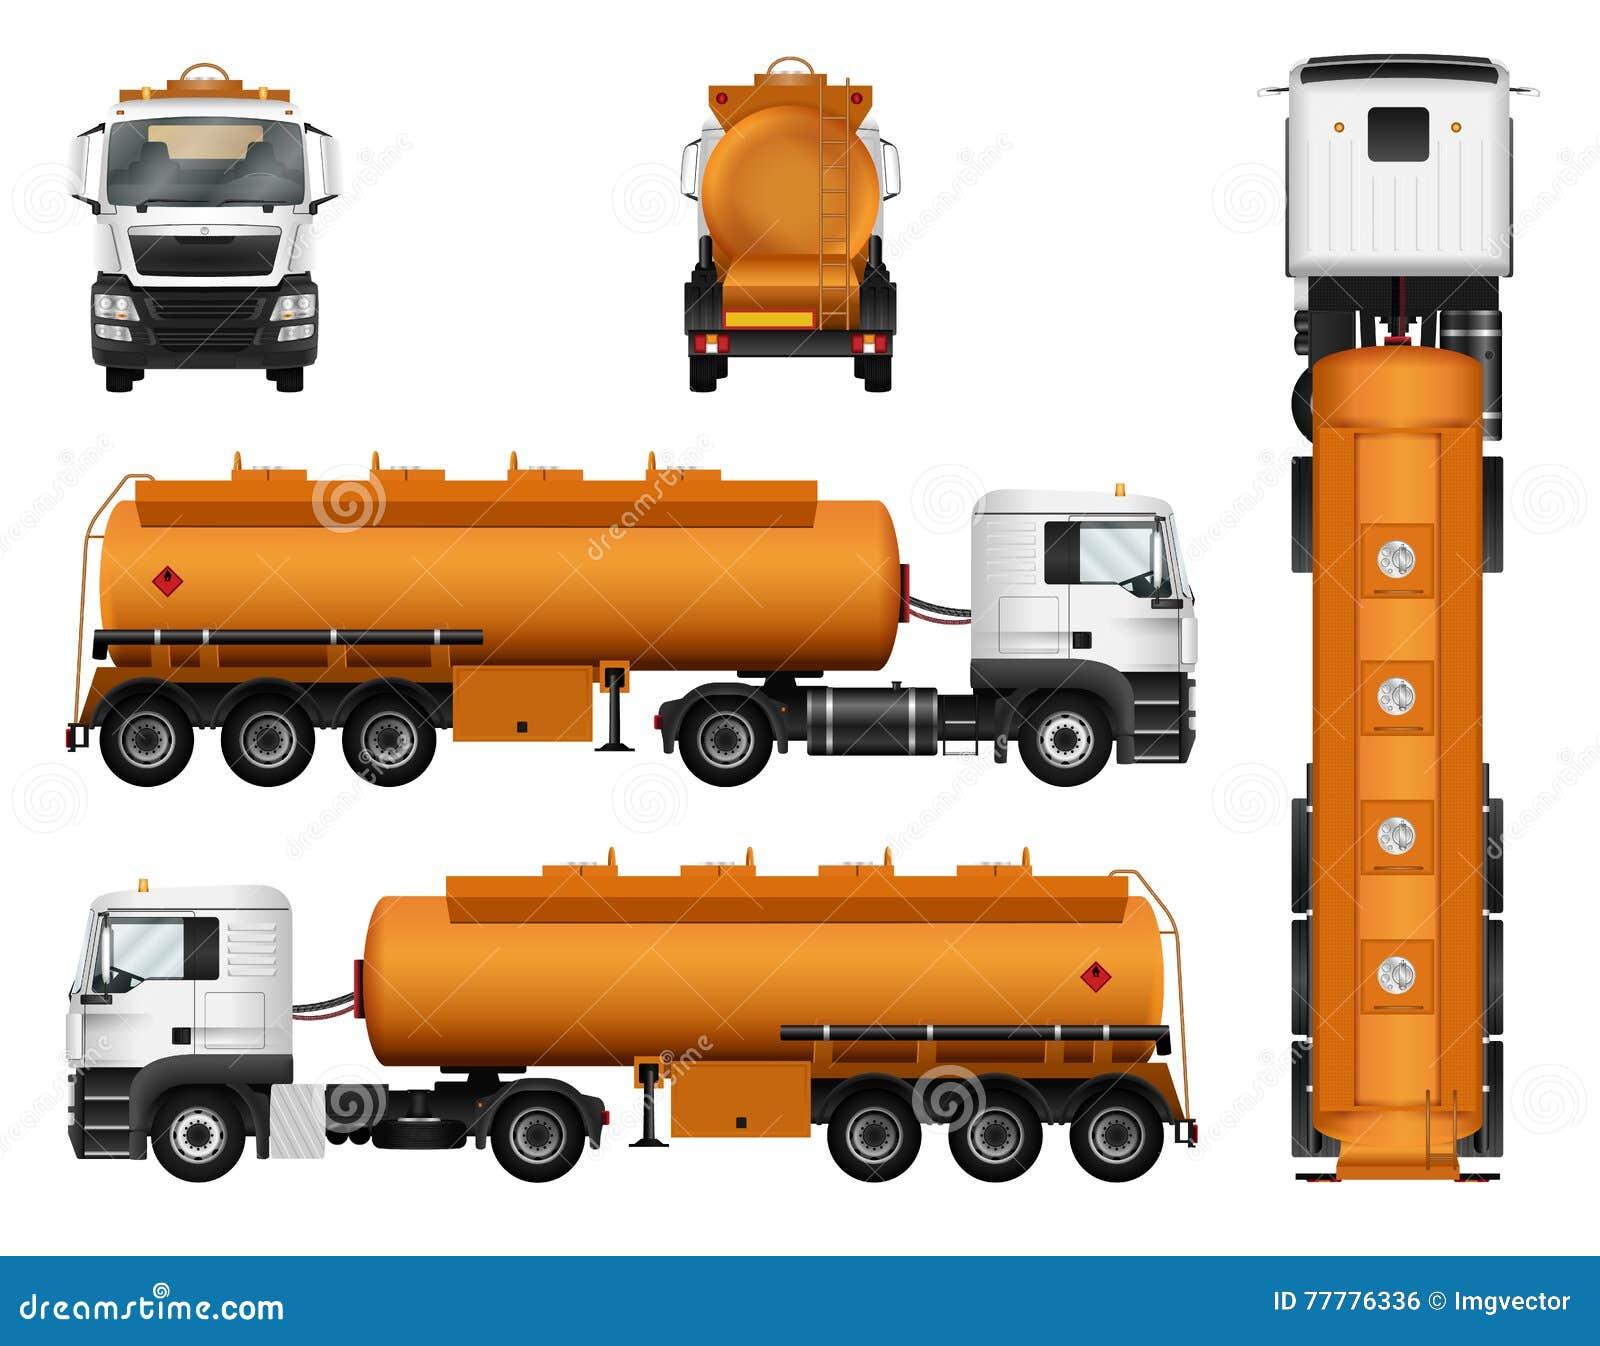 5 x 10 cargo trailer circuit diagram maker. Black Bedroom Furniture Sets. Home Design Ideas